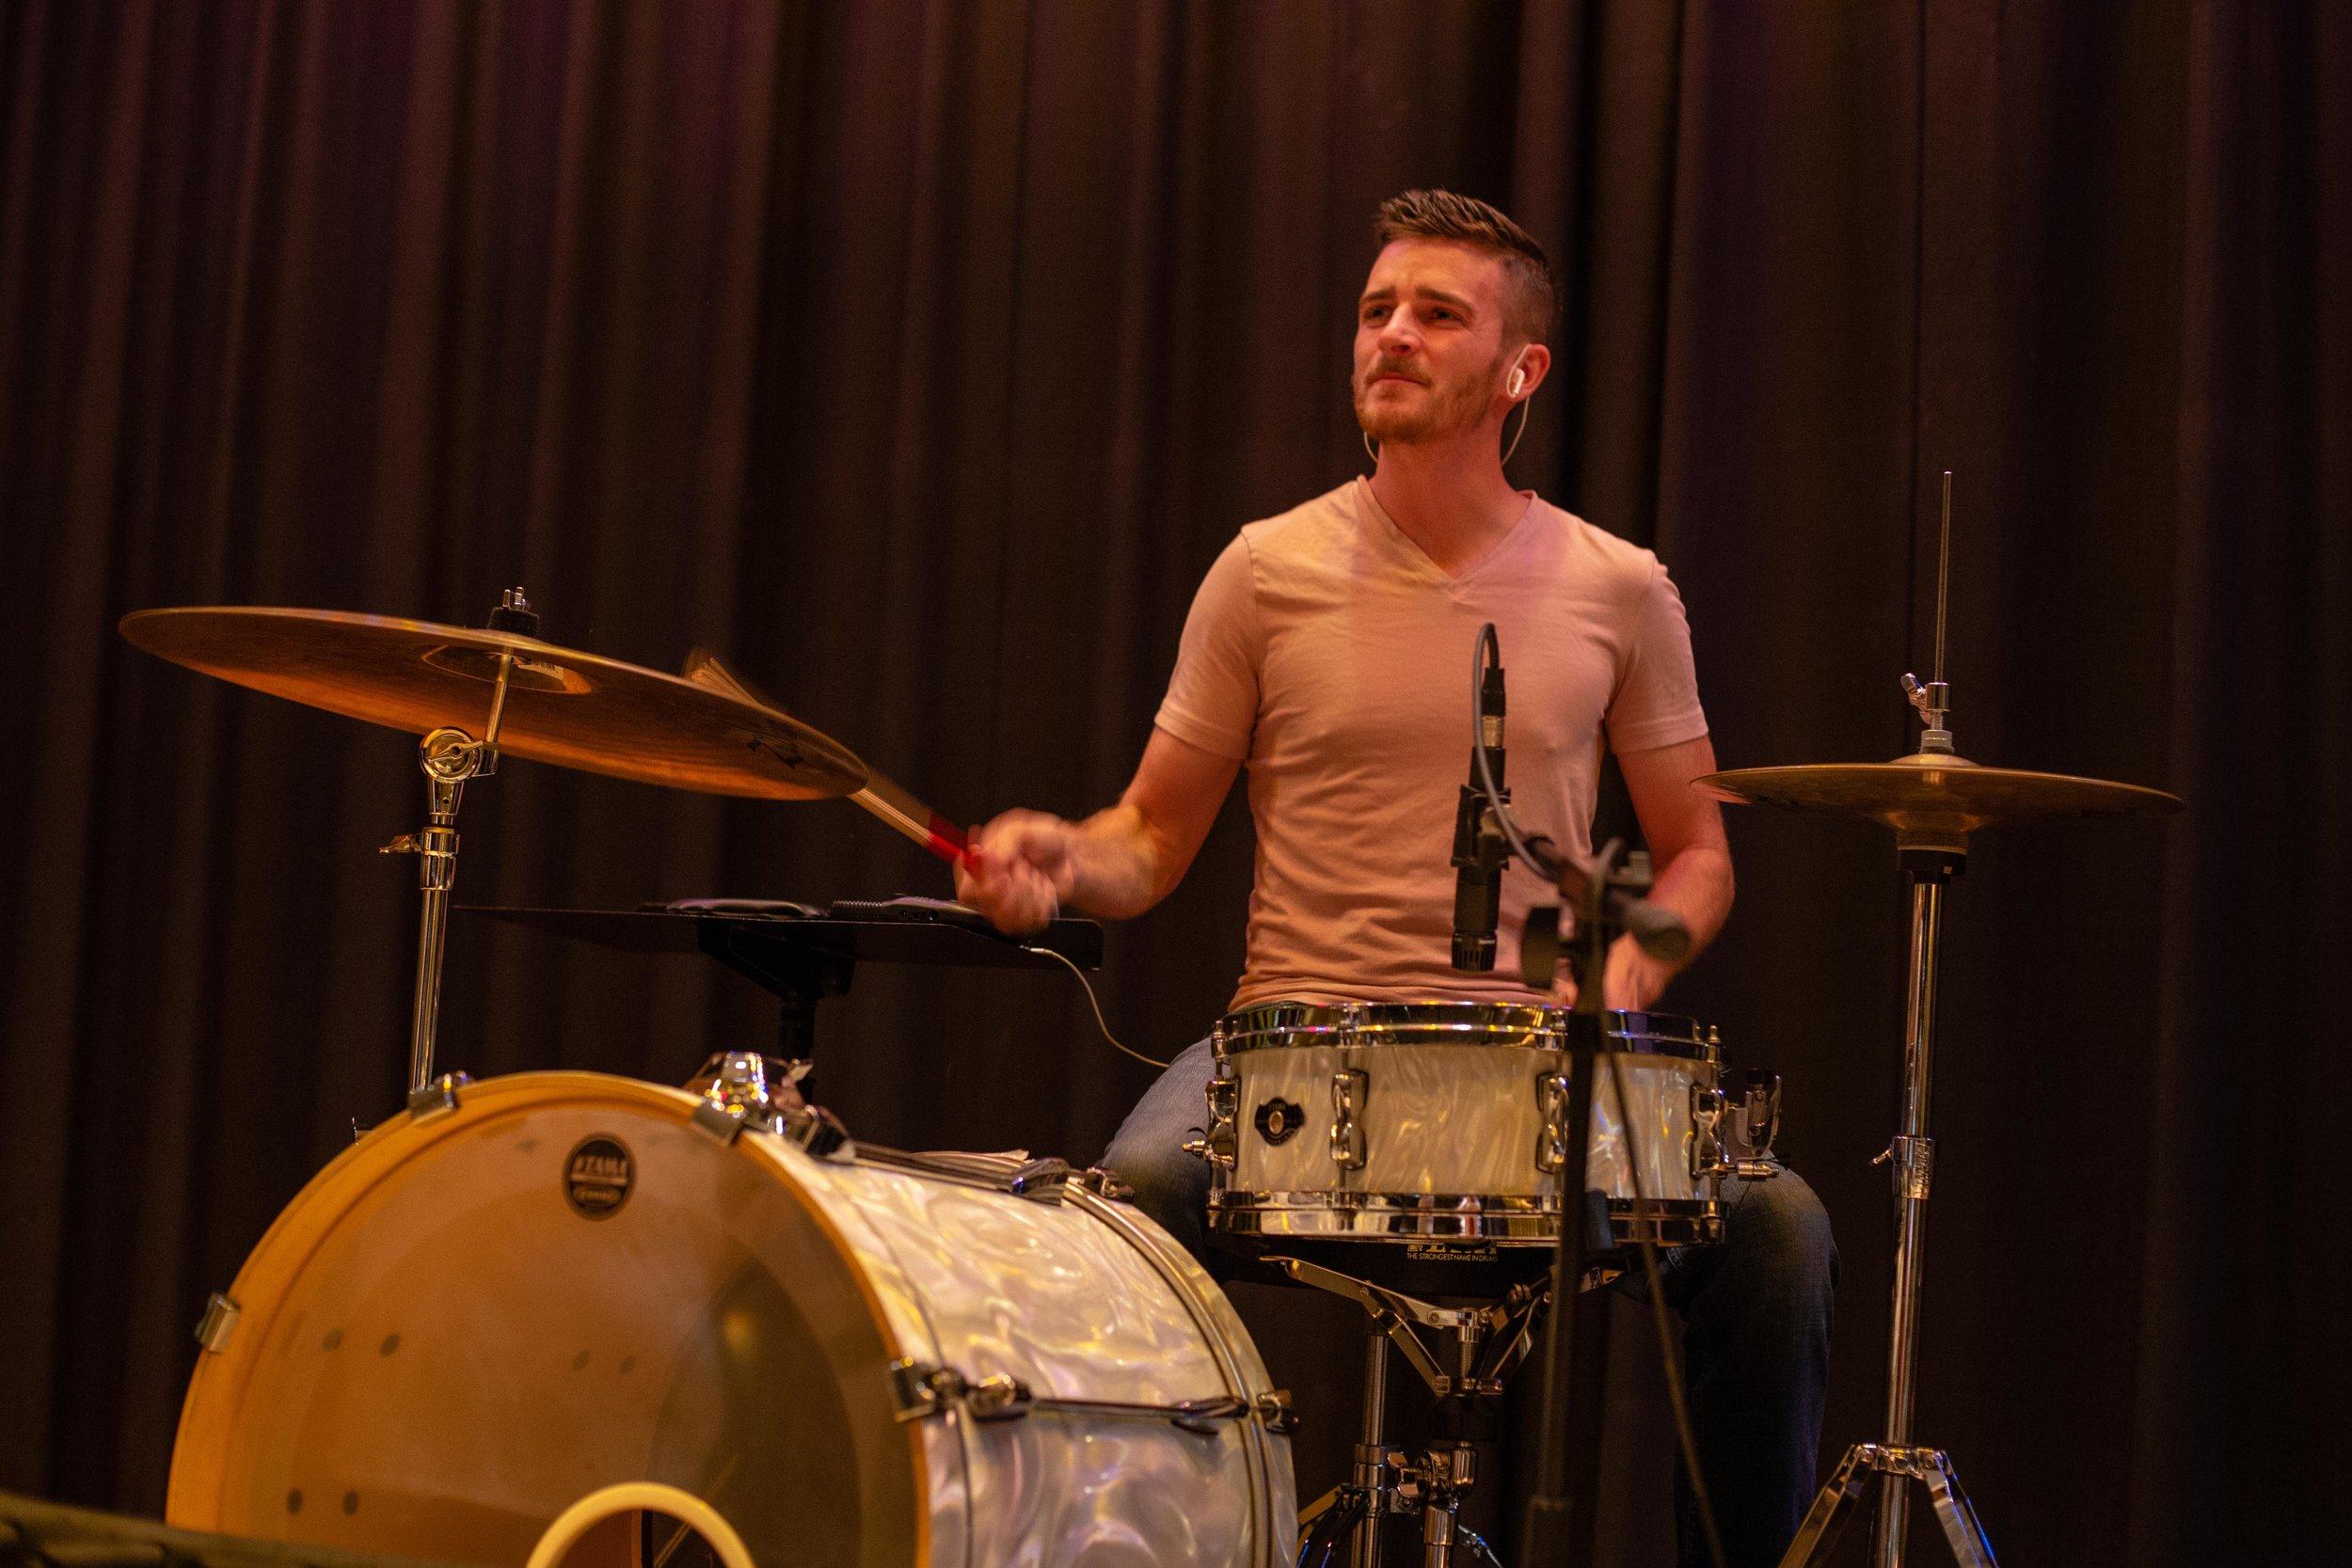 The Band: Drummer - Volunteer